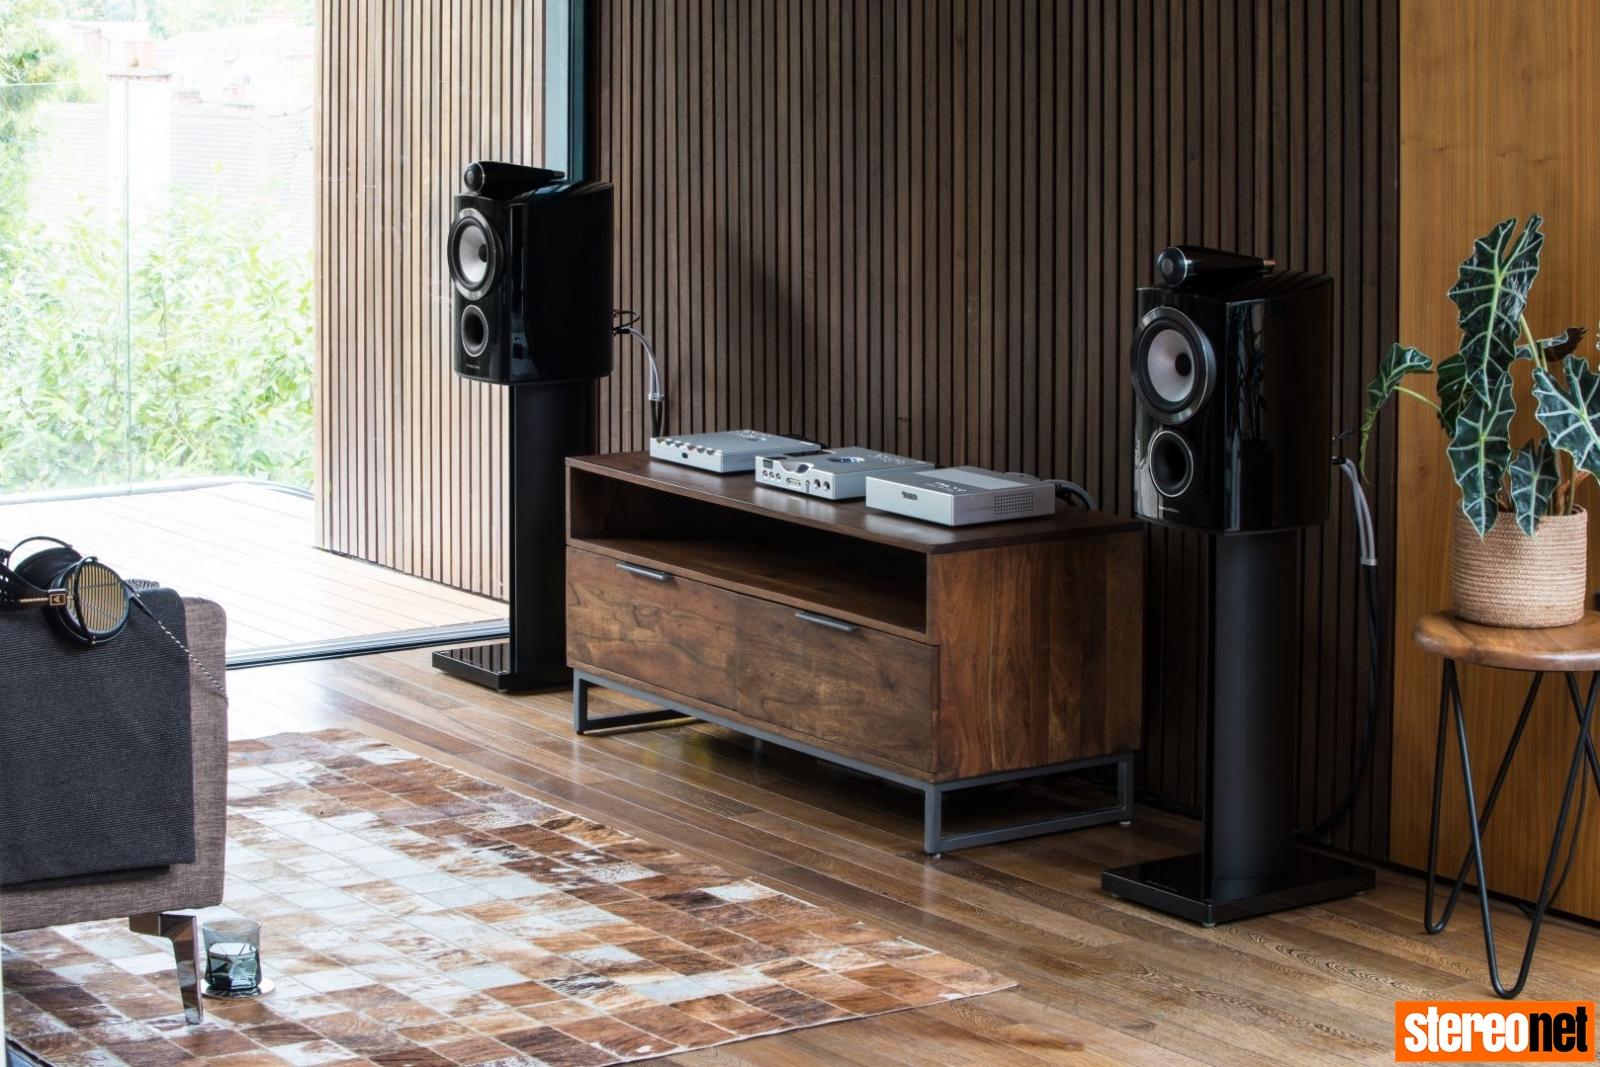 Chord Electronics NAMM 2019